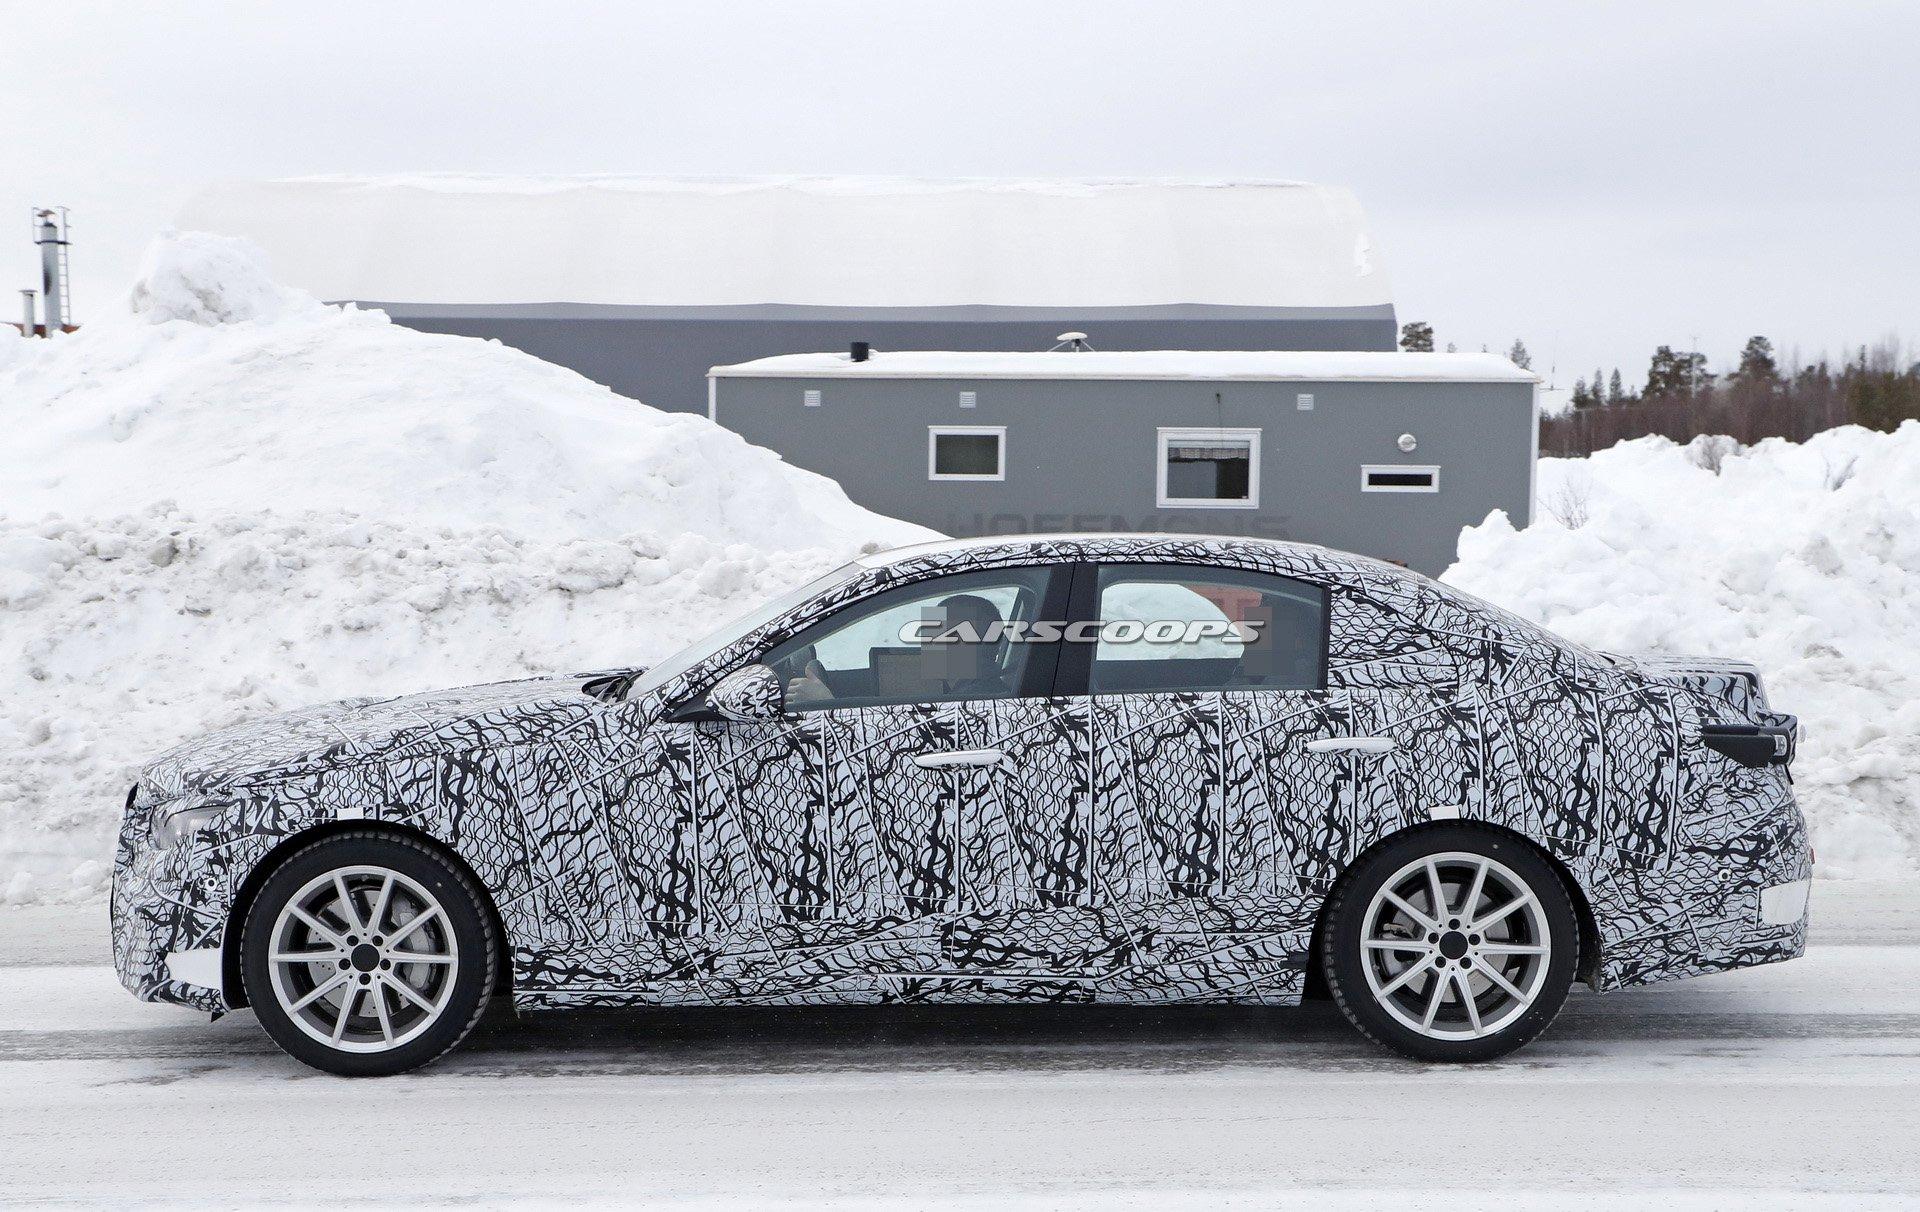 Nuova Mercedes-AMG C 63 foto spia